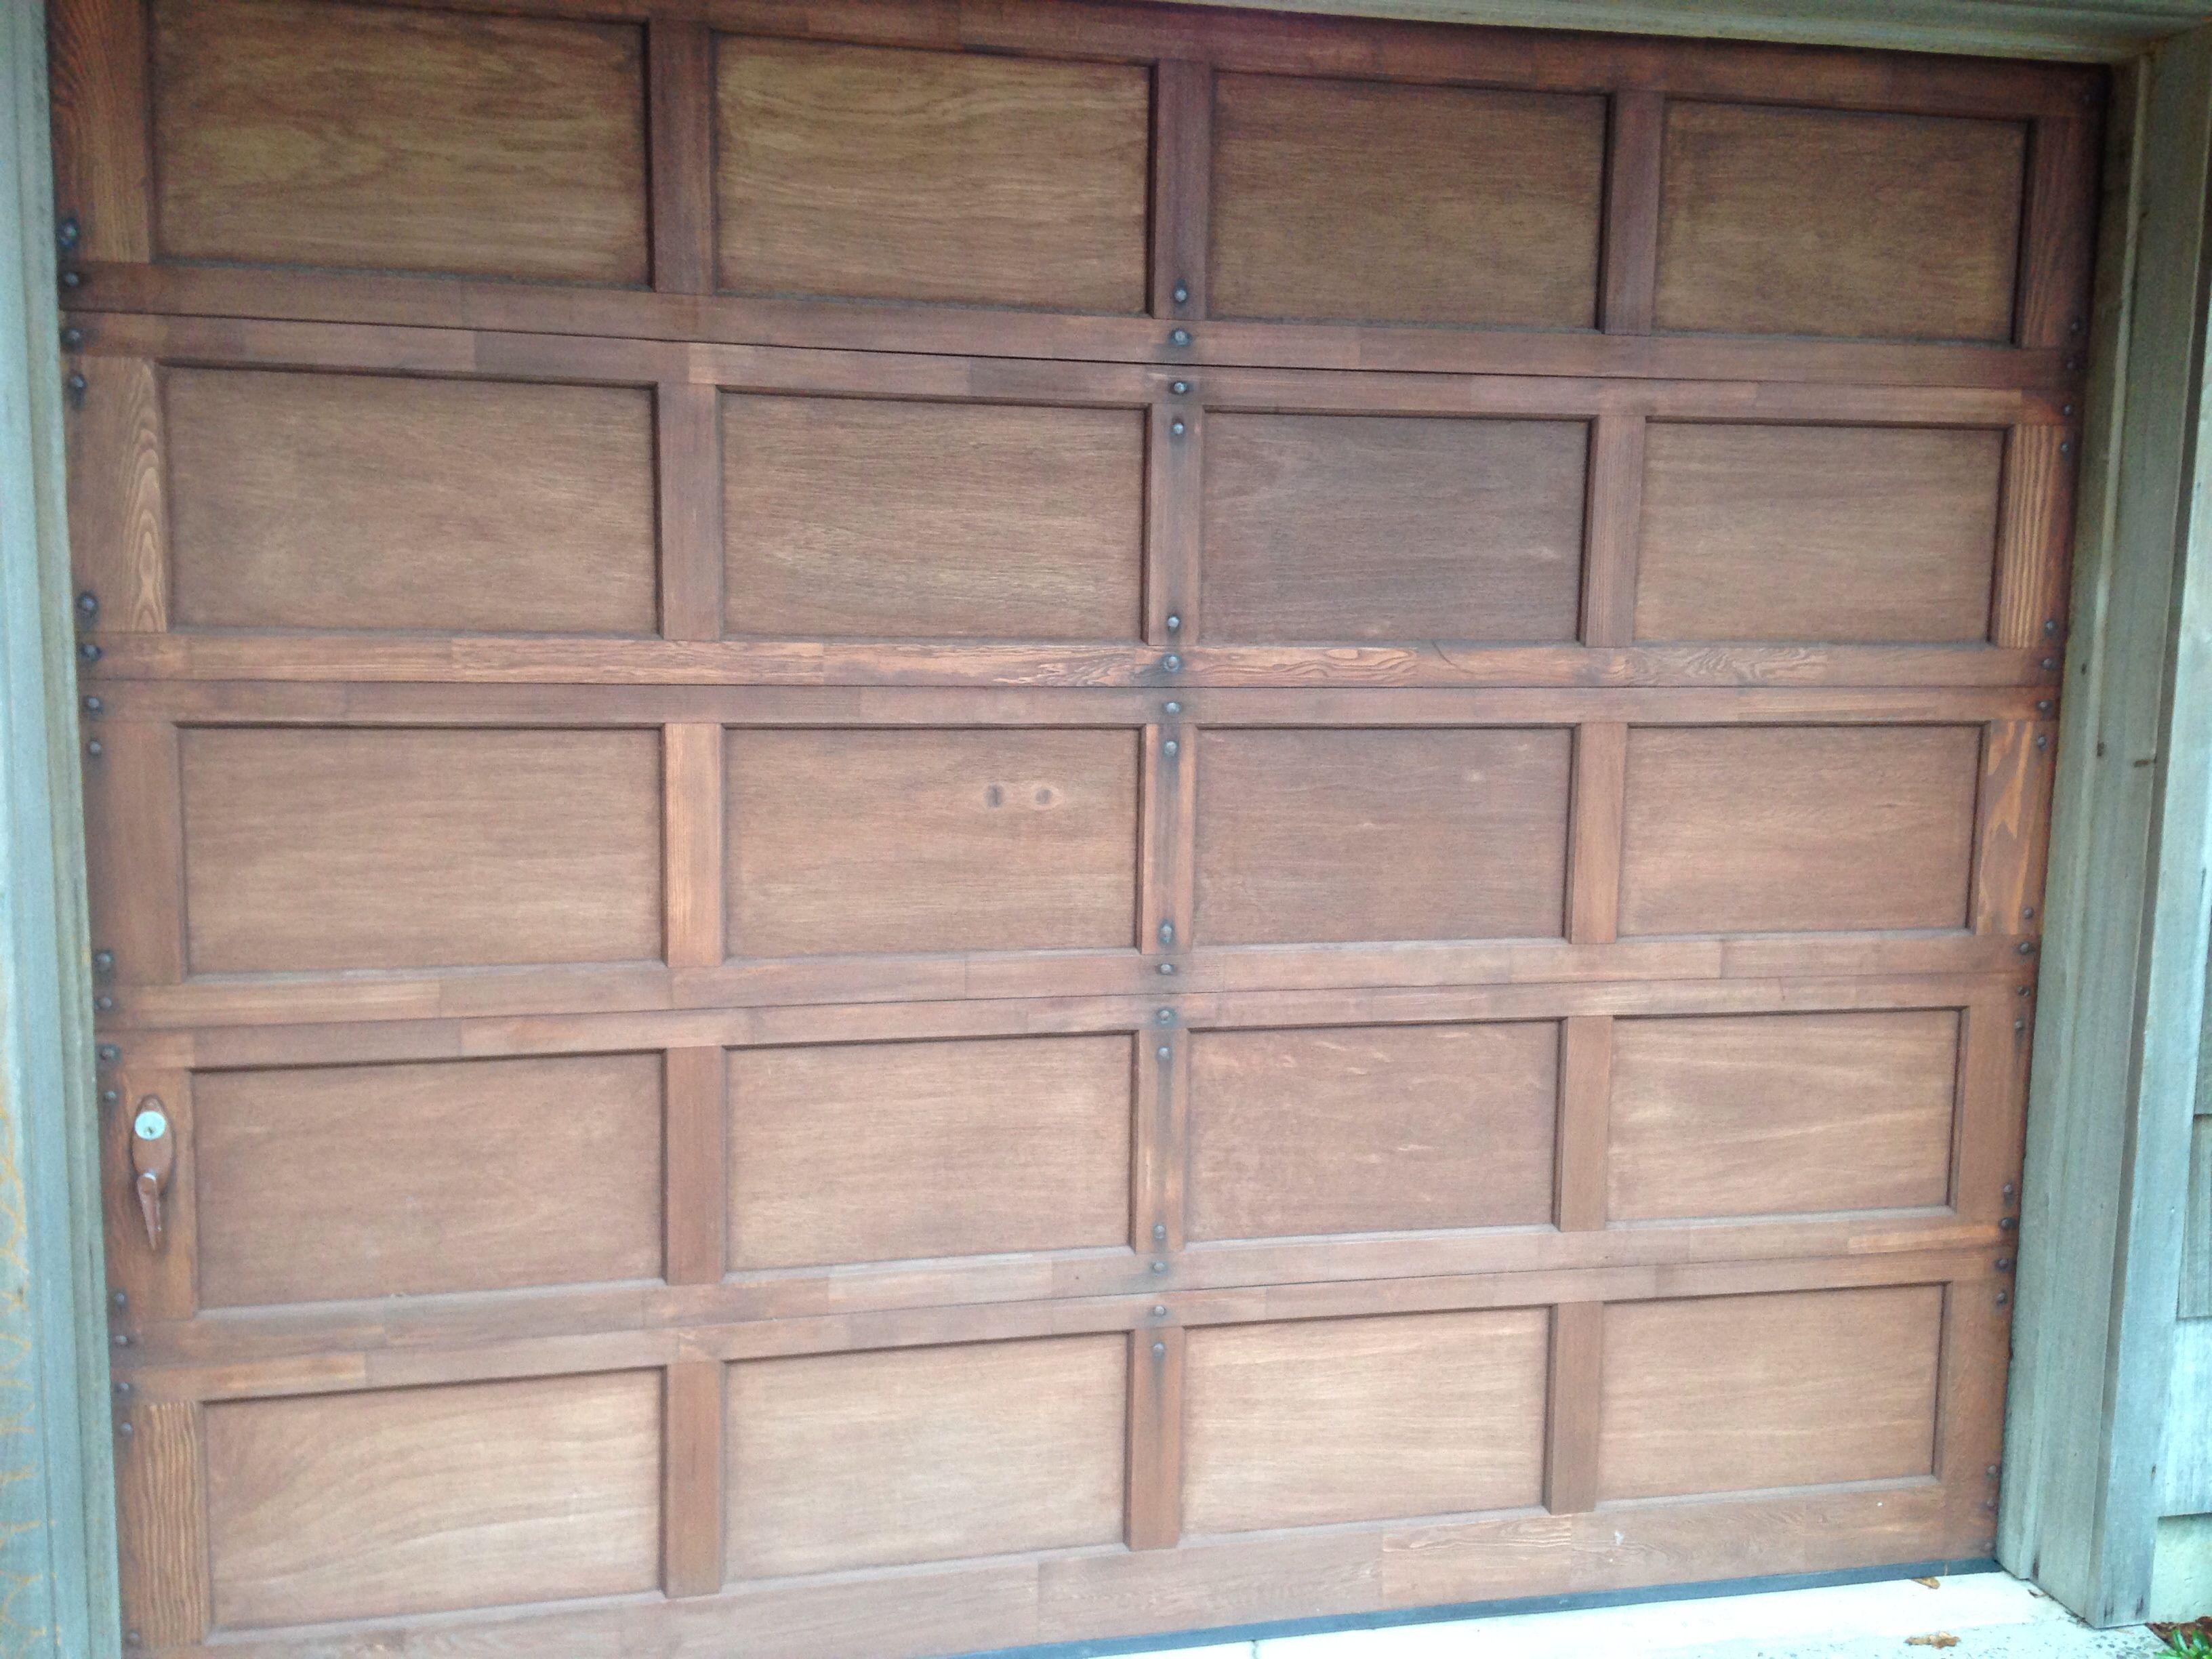 People Often Upgrade Their Old Wood Recessed Panel Garage Doors Like